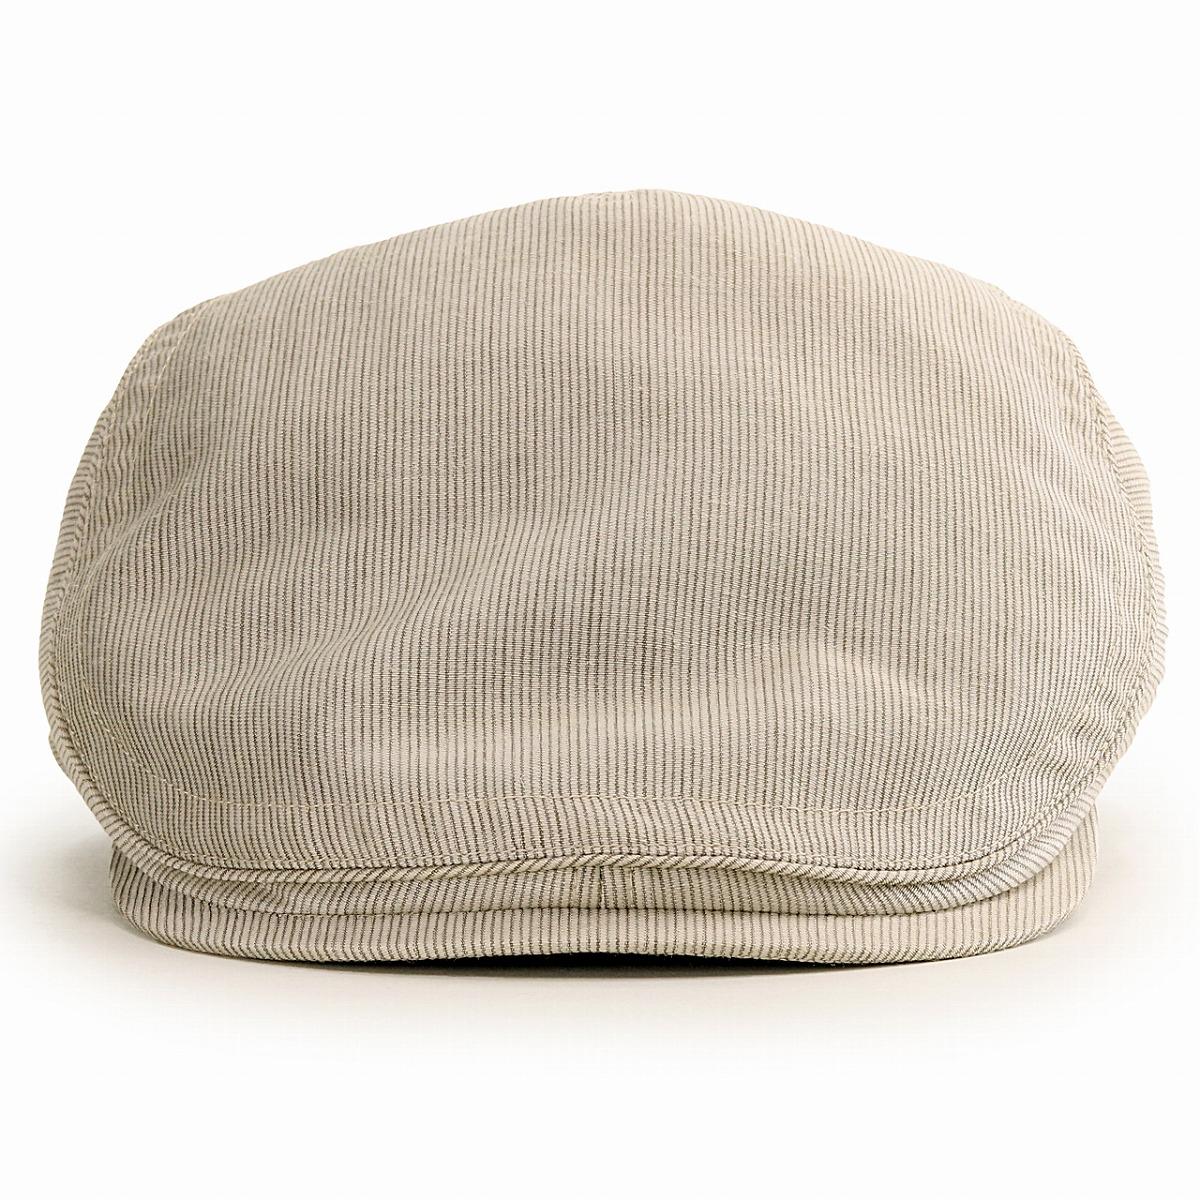 8be267794cd Mila Schon hat stripe Mila Schon hunting cap men S M L LL hunting cap hat  gentleman big size Lamy dobby hemp product made in cool hunting cap hat  Lady s ...